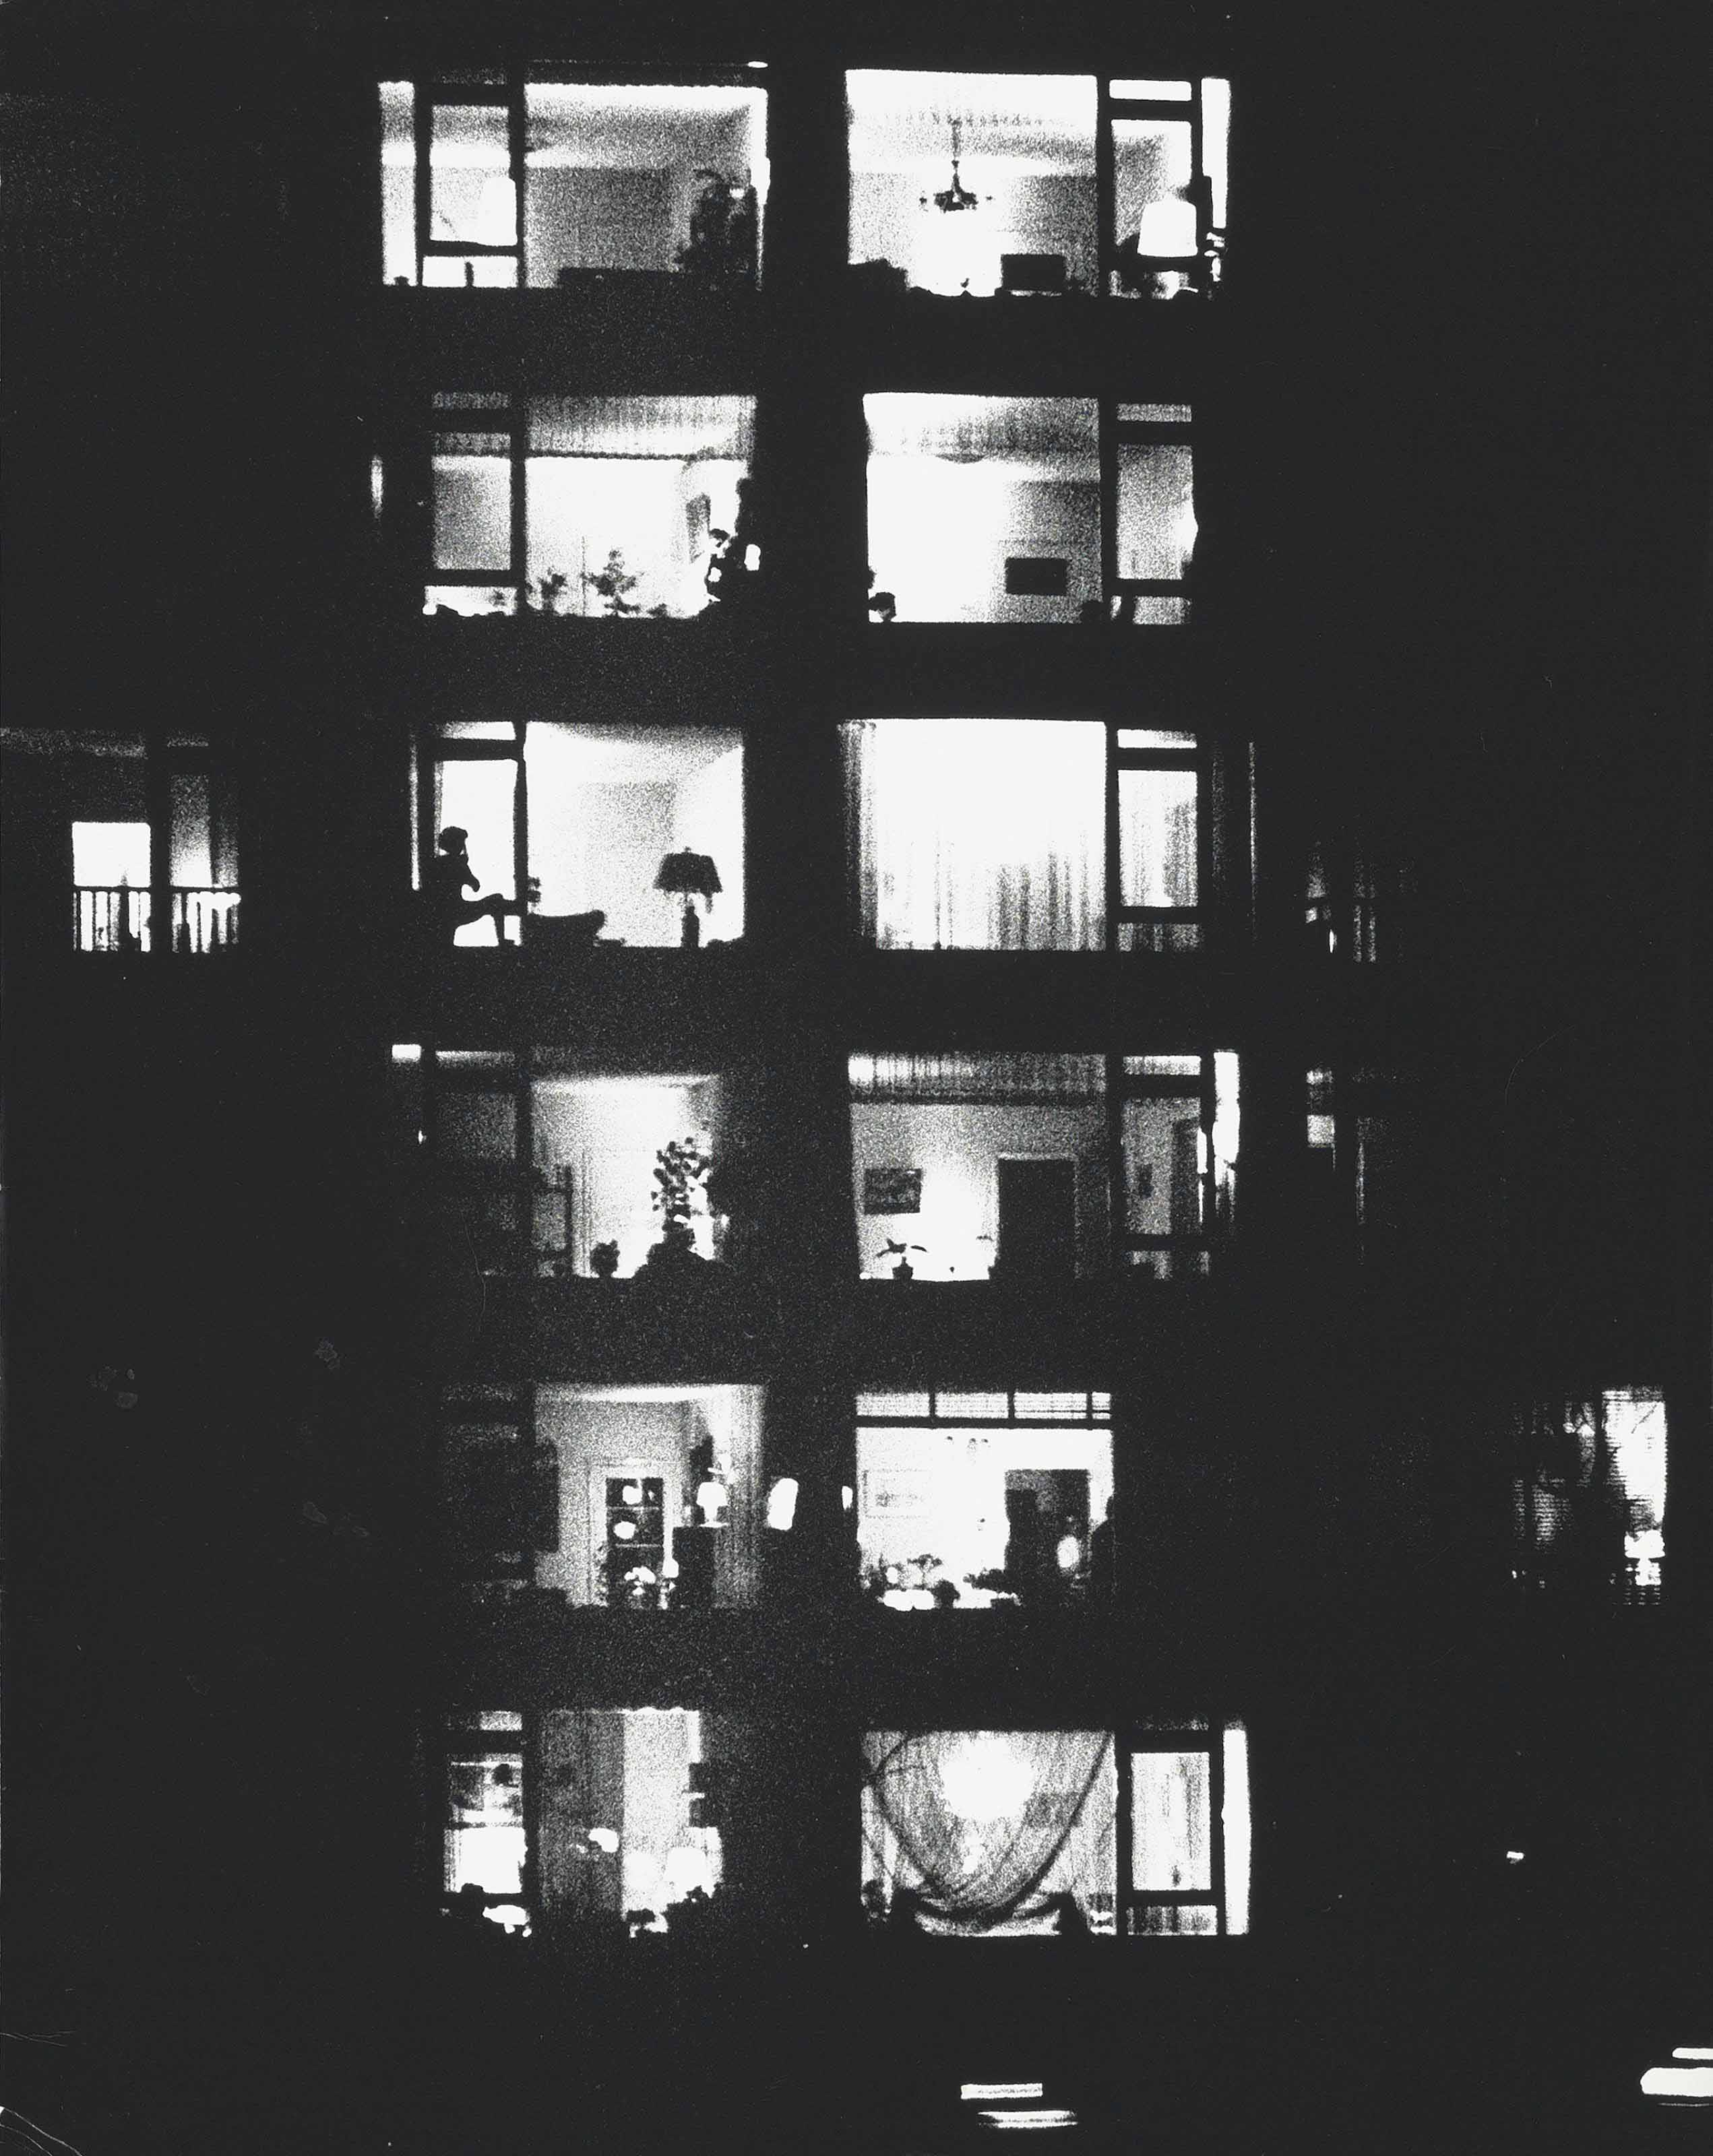 Untitled (Illuminated building at night), c. 1960